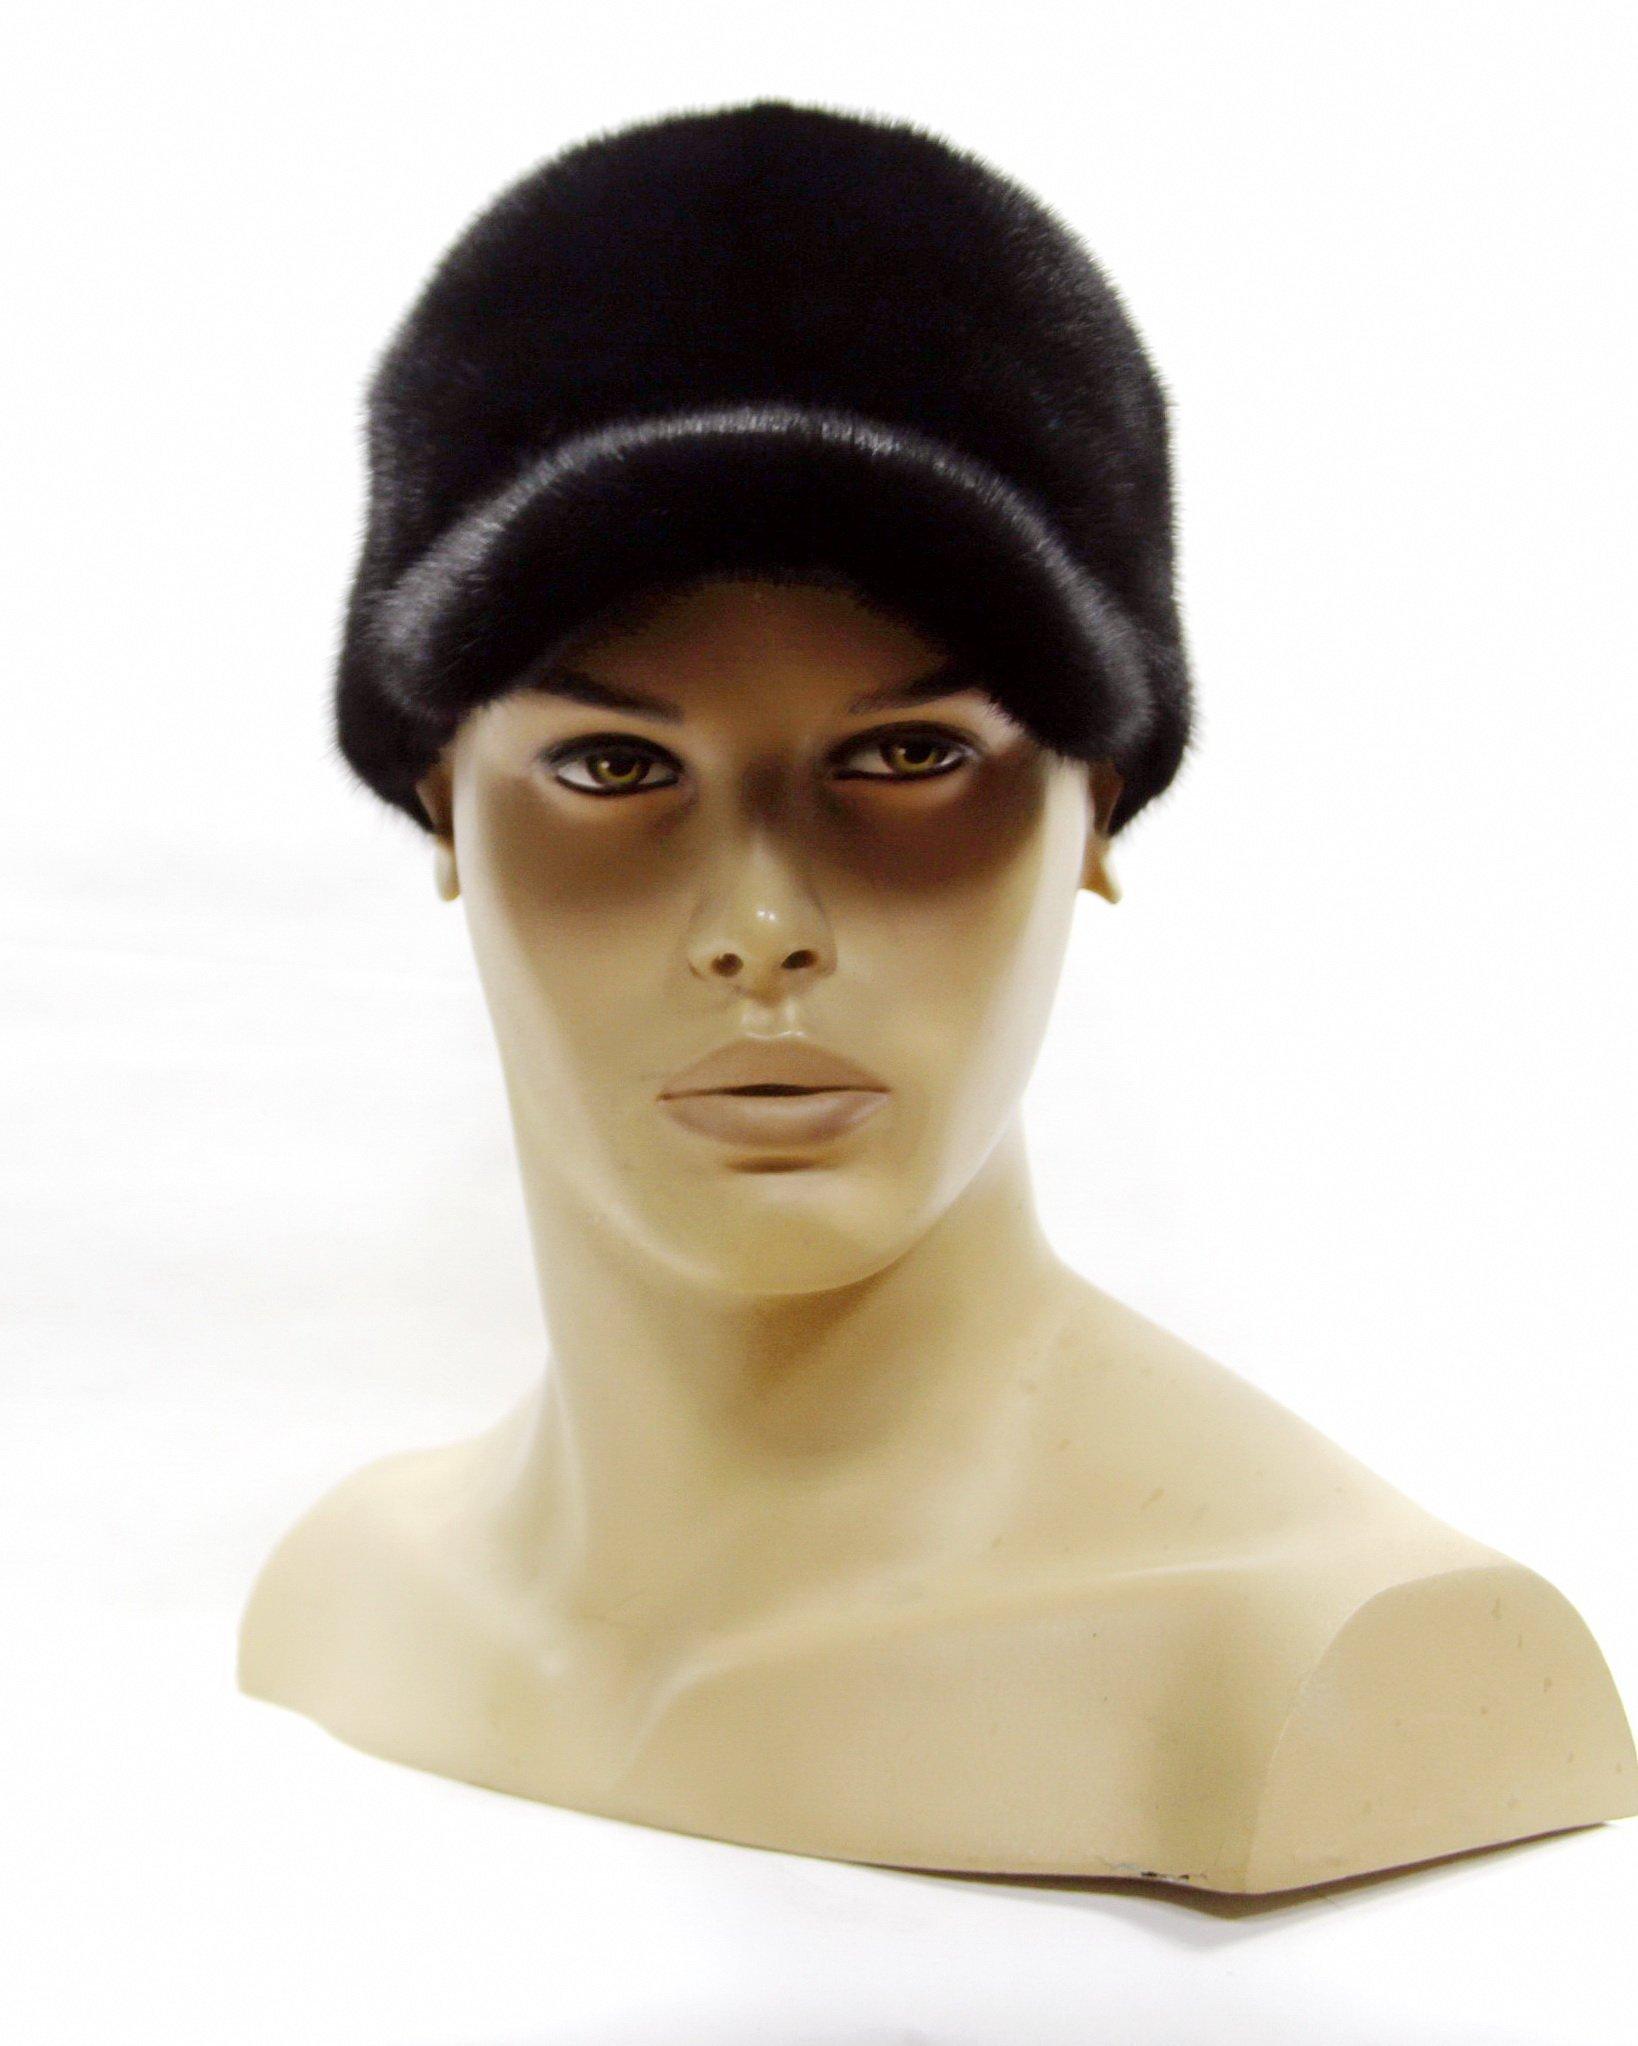 Men's baseball cap is made of natural mink fur handmade.